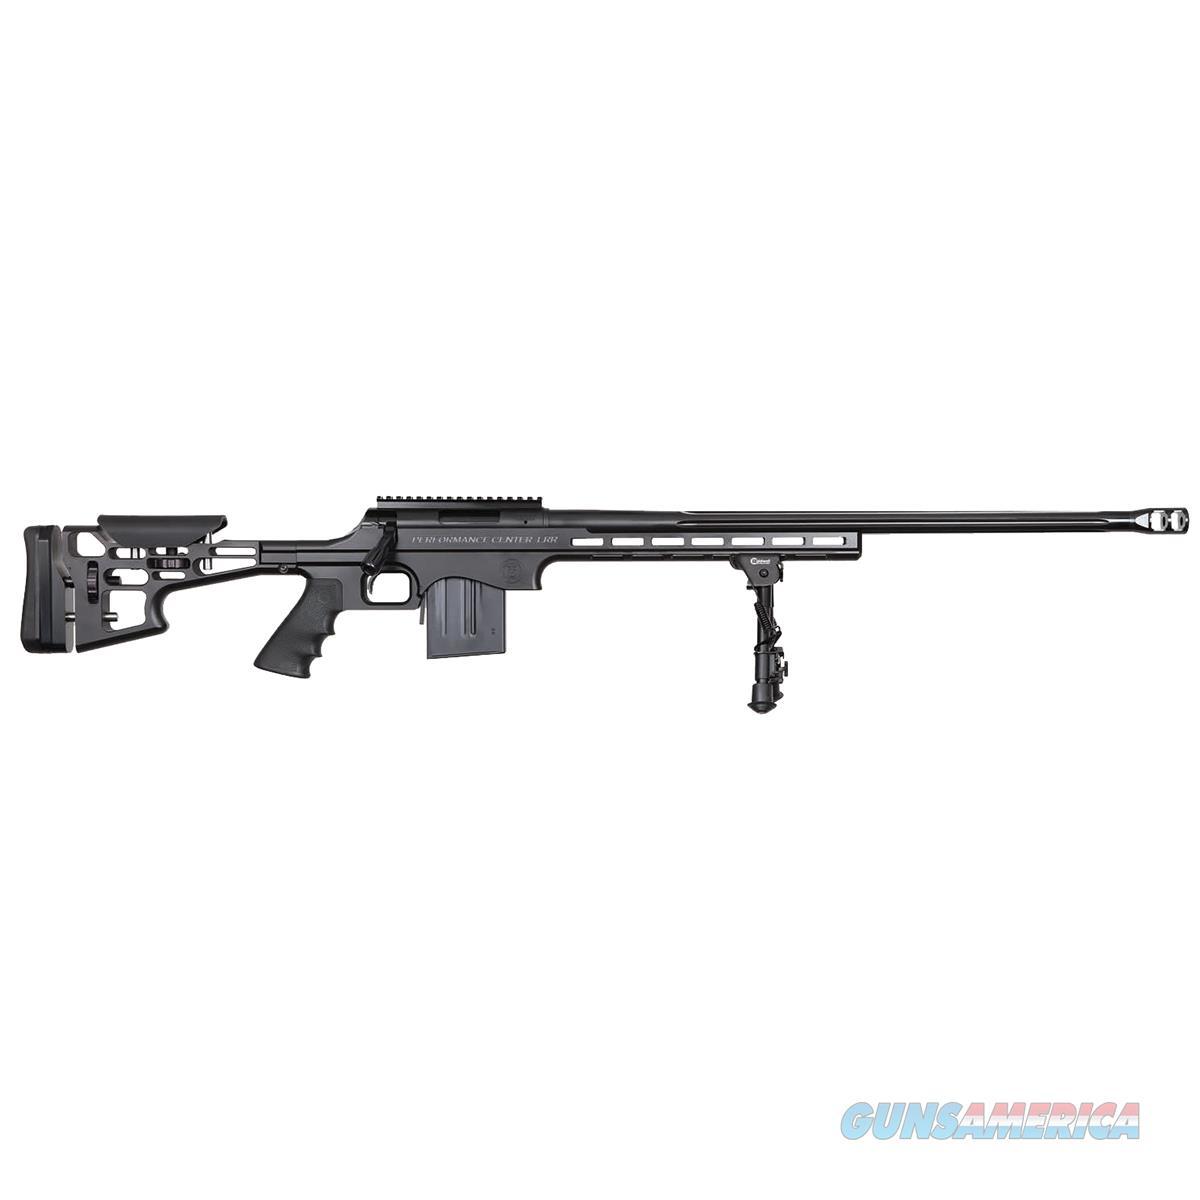 Thompson Center Performance Center Lrr Rifle 11889  Guns > Rifles > TU Misc Rifles